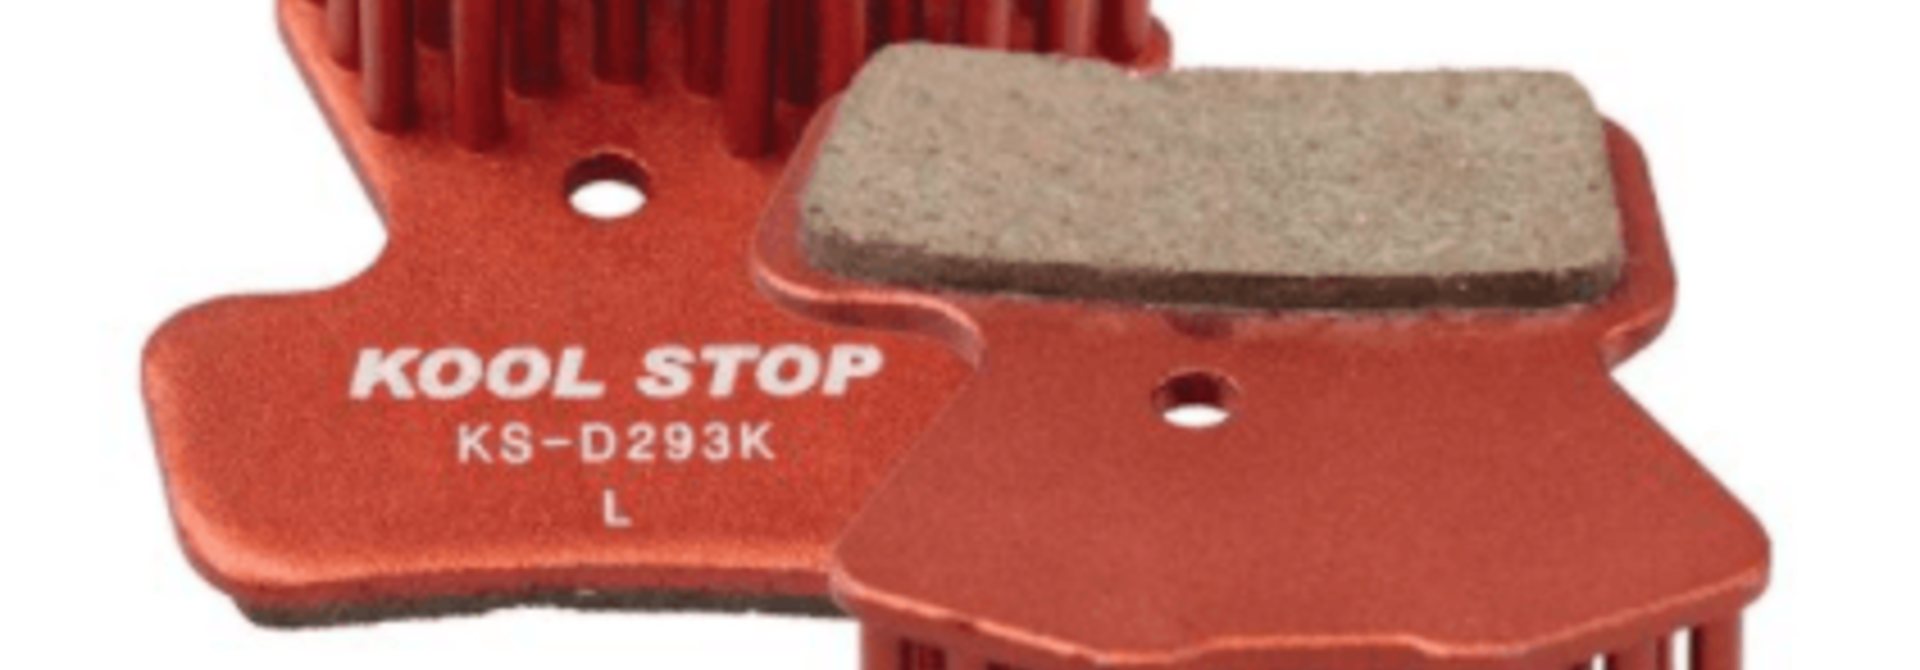 Kool-Stop XO/Elixir/Guide, Disc Brake Pads, Aero Kool, Organic